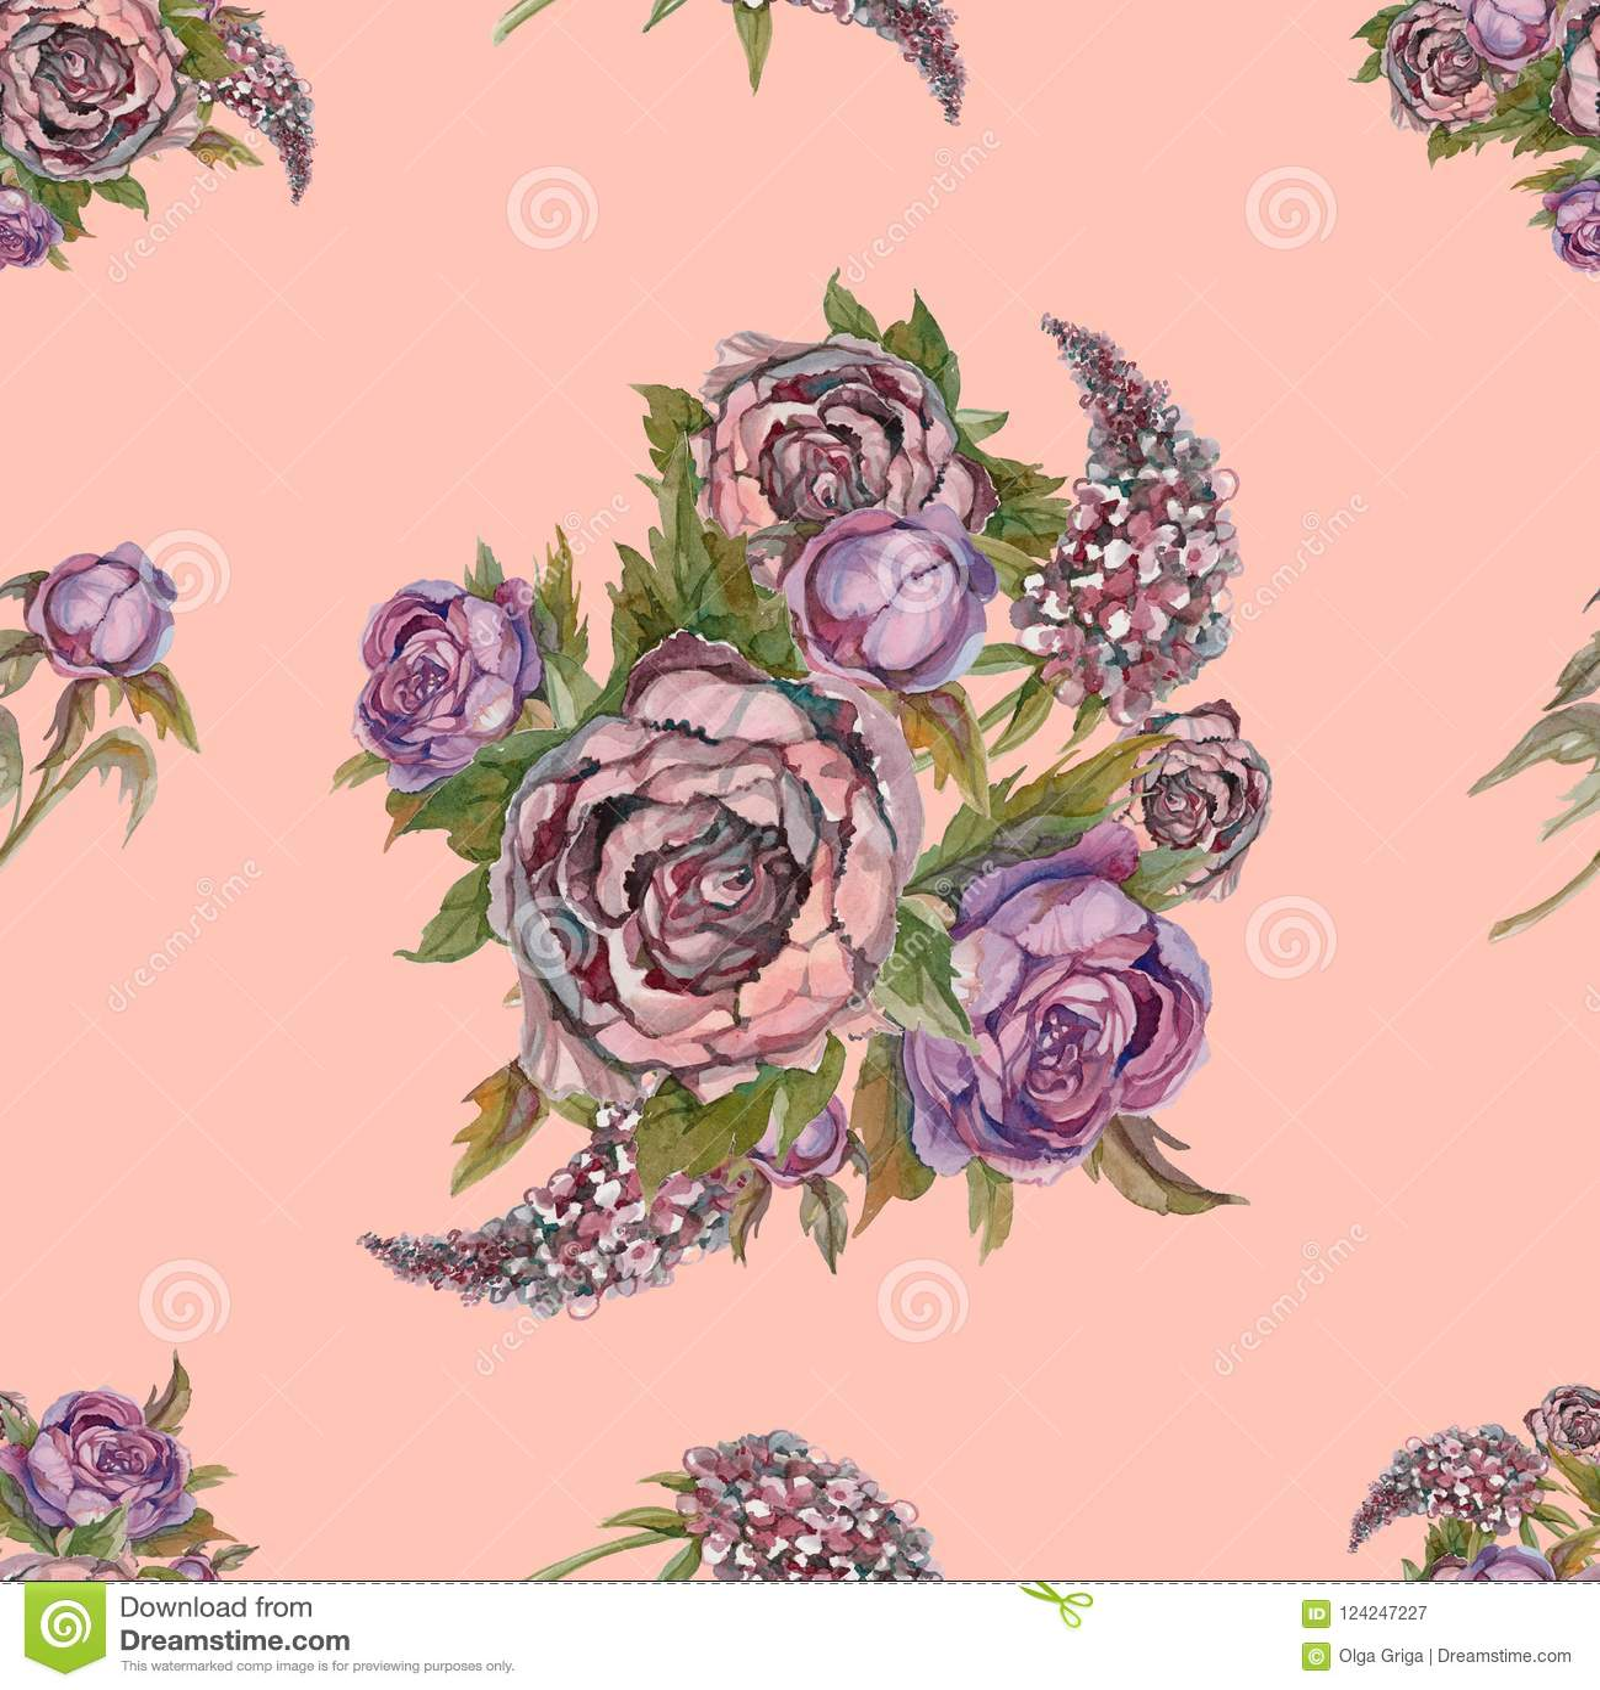 Modelo Inconsutil Floral Flores De La Acuarela Rosas Peonias Lilas